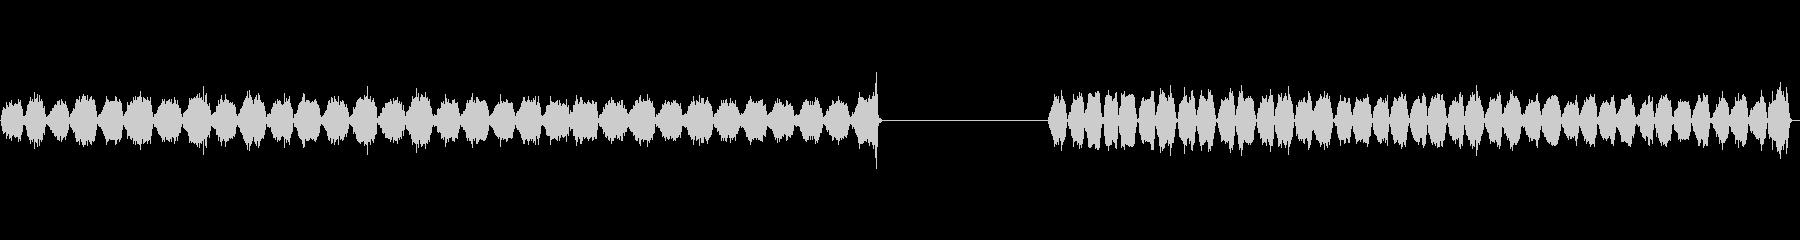 GLASSPAPER、FINE P...の未再生の波形